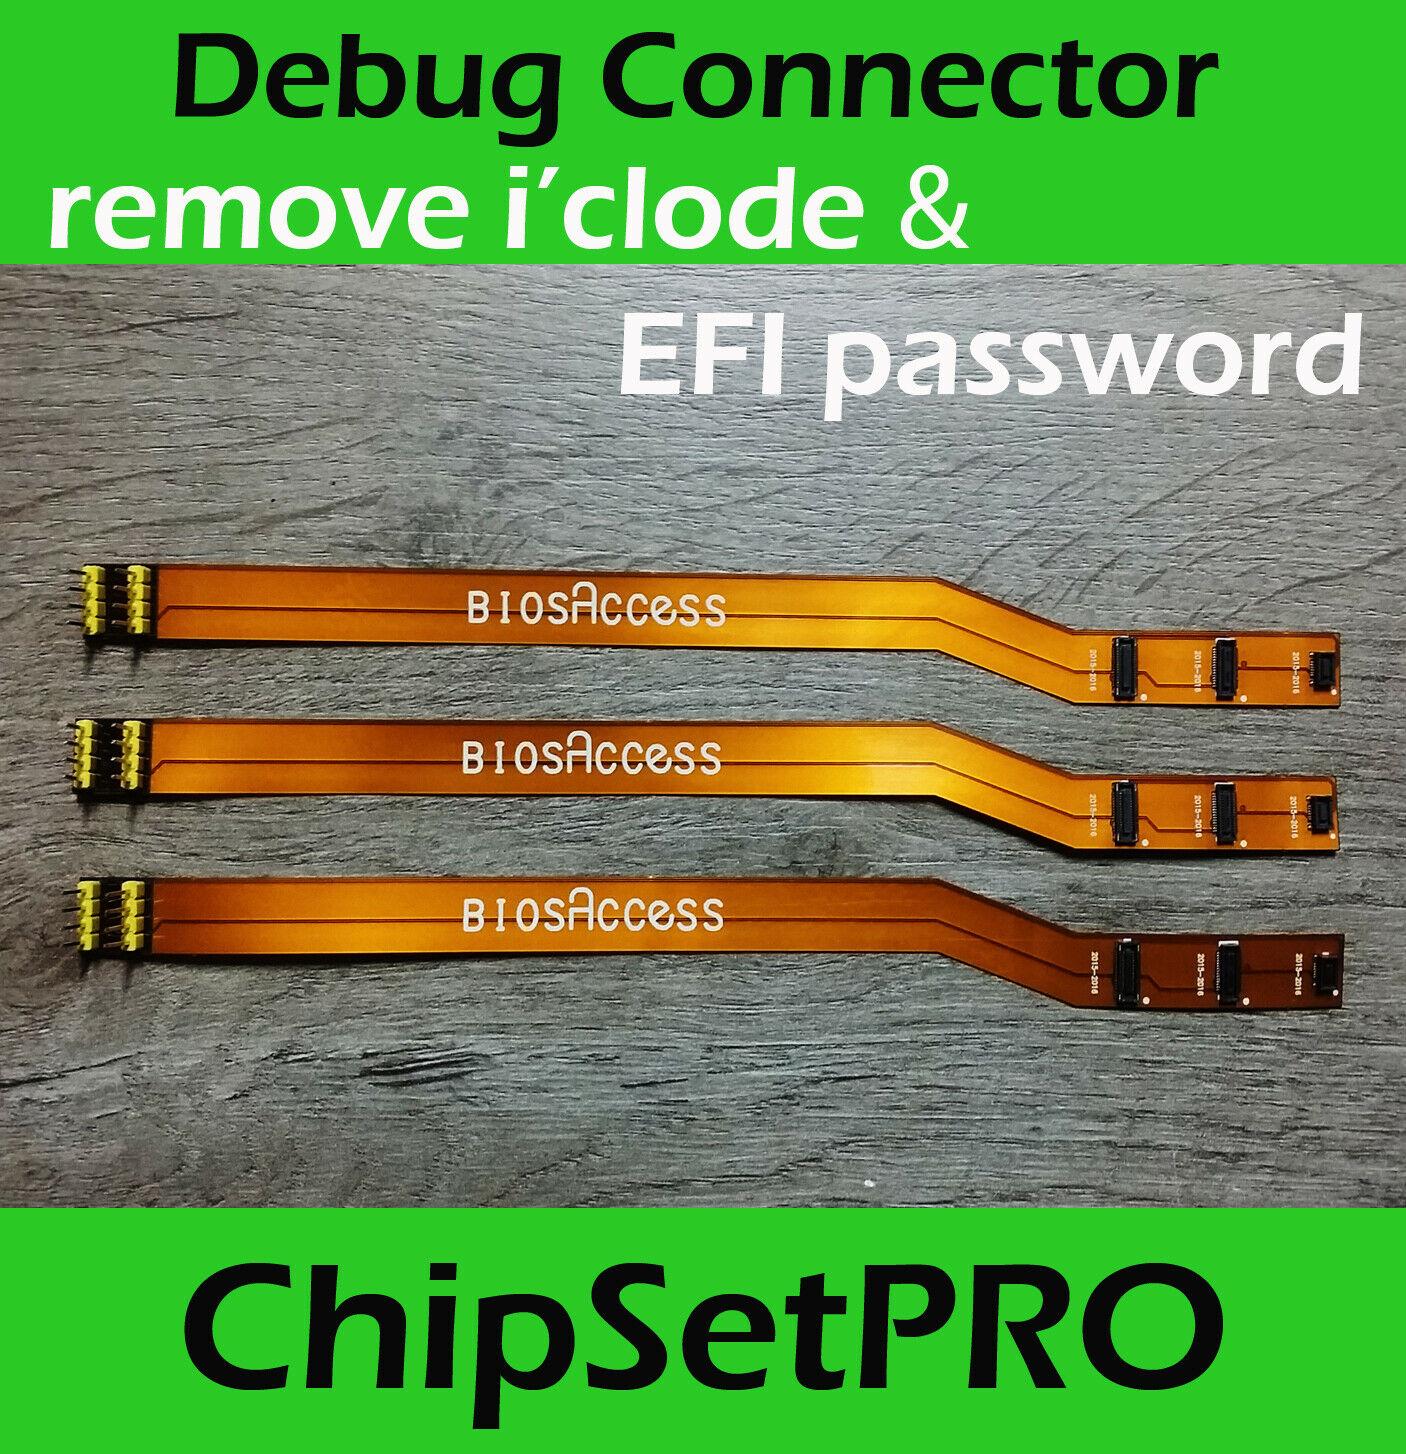 SPI SWD SAM EFI ROM Debug Connector FLASH BOOTROM Cable Icloud For Apple Macbook PRO EFI SPI Cable